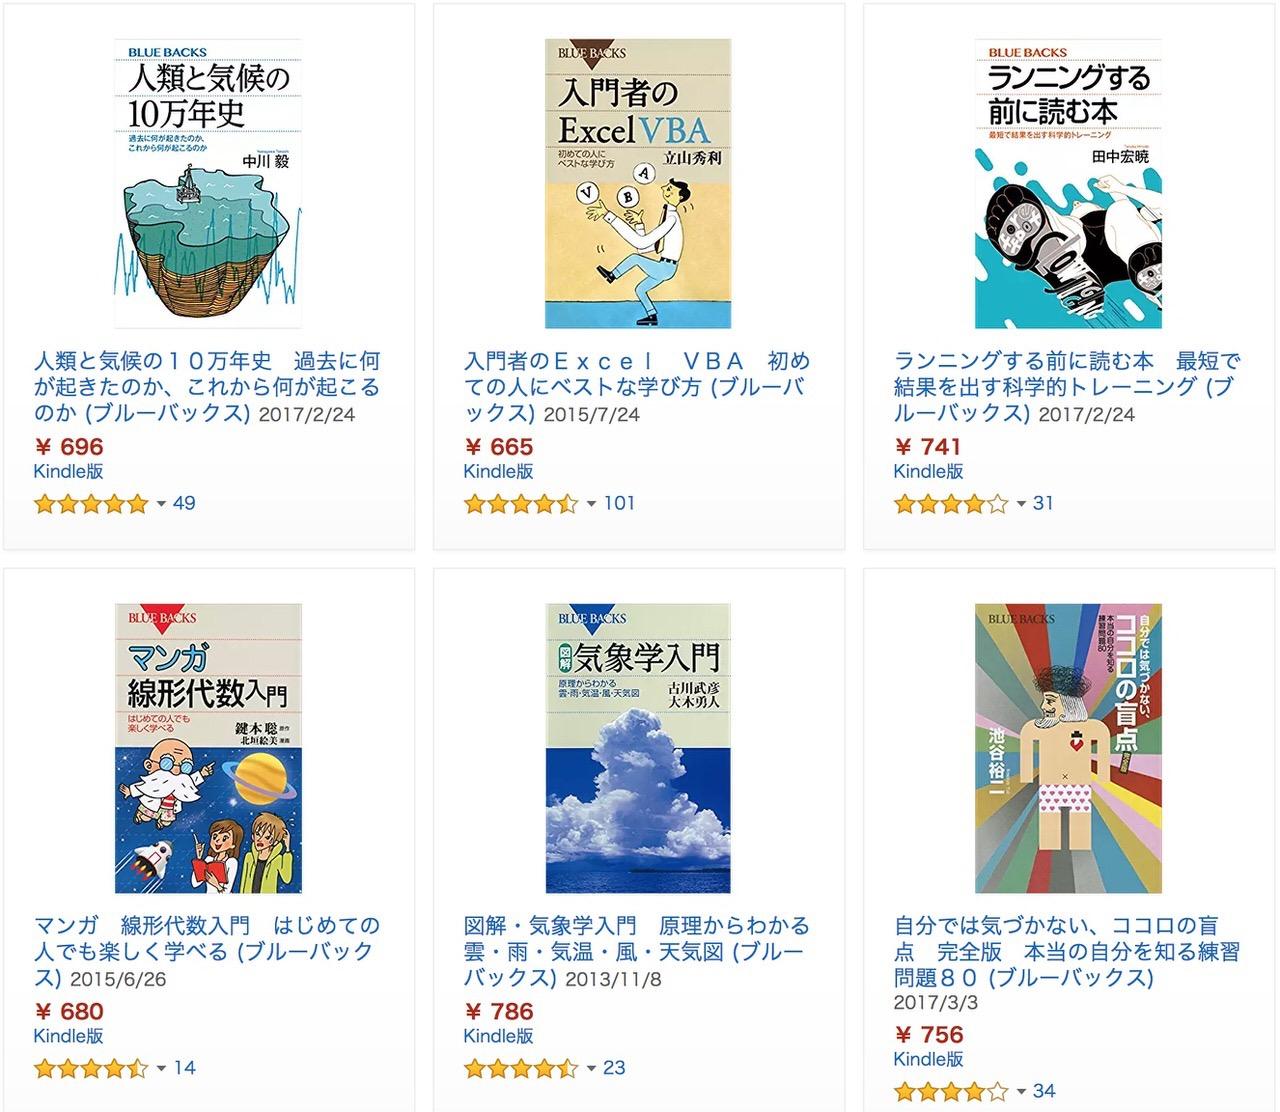 【Kindleセール】【夏☆電書2018】55周年記念「やさしい」ブルーバックスフェア